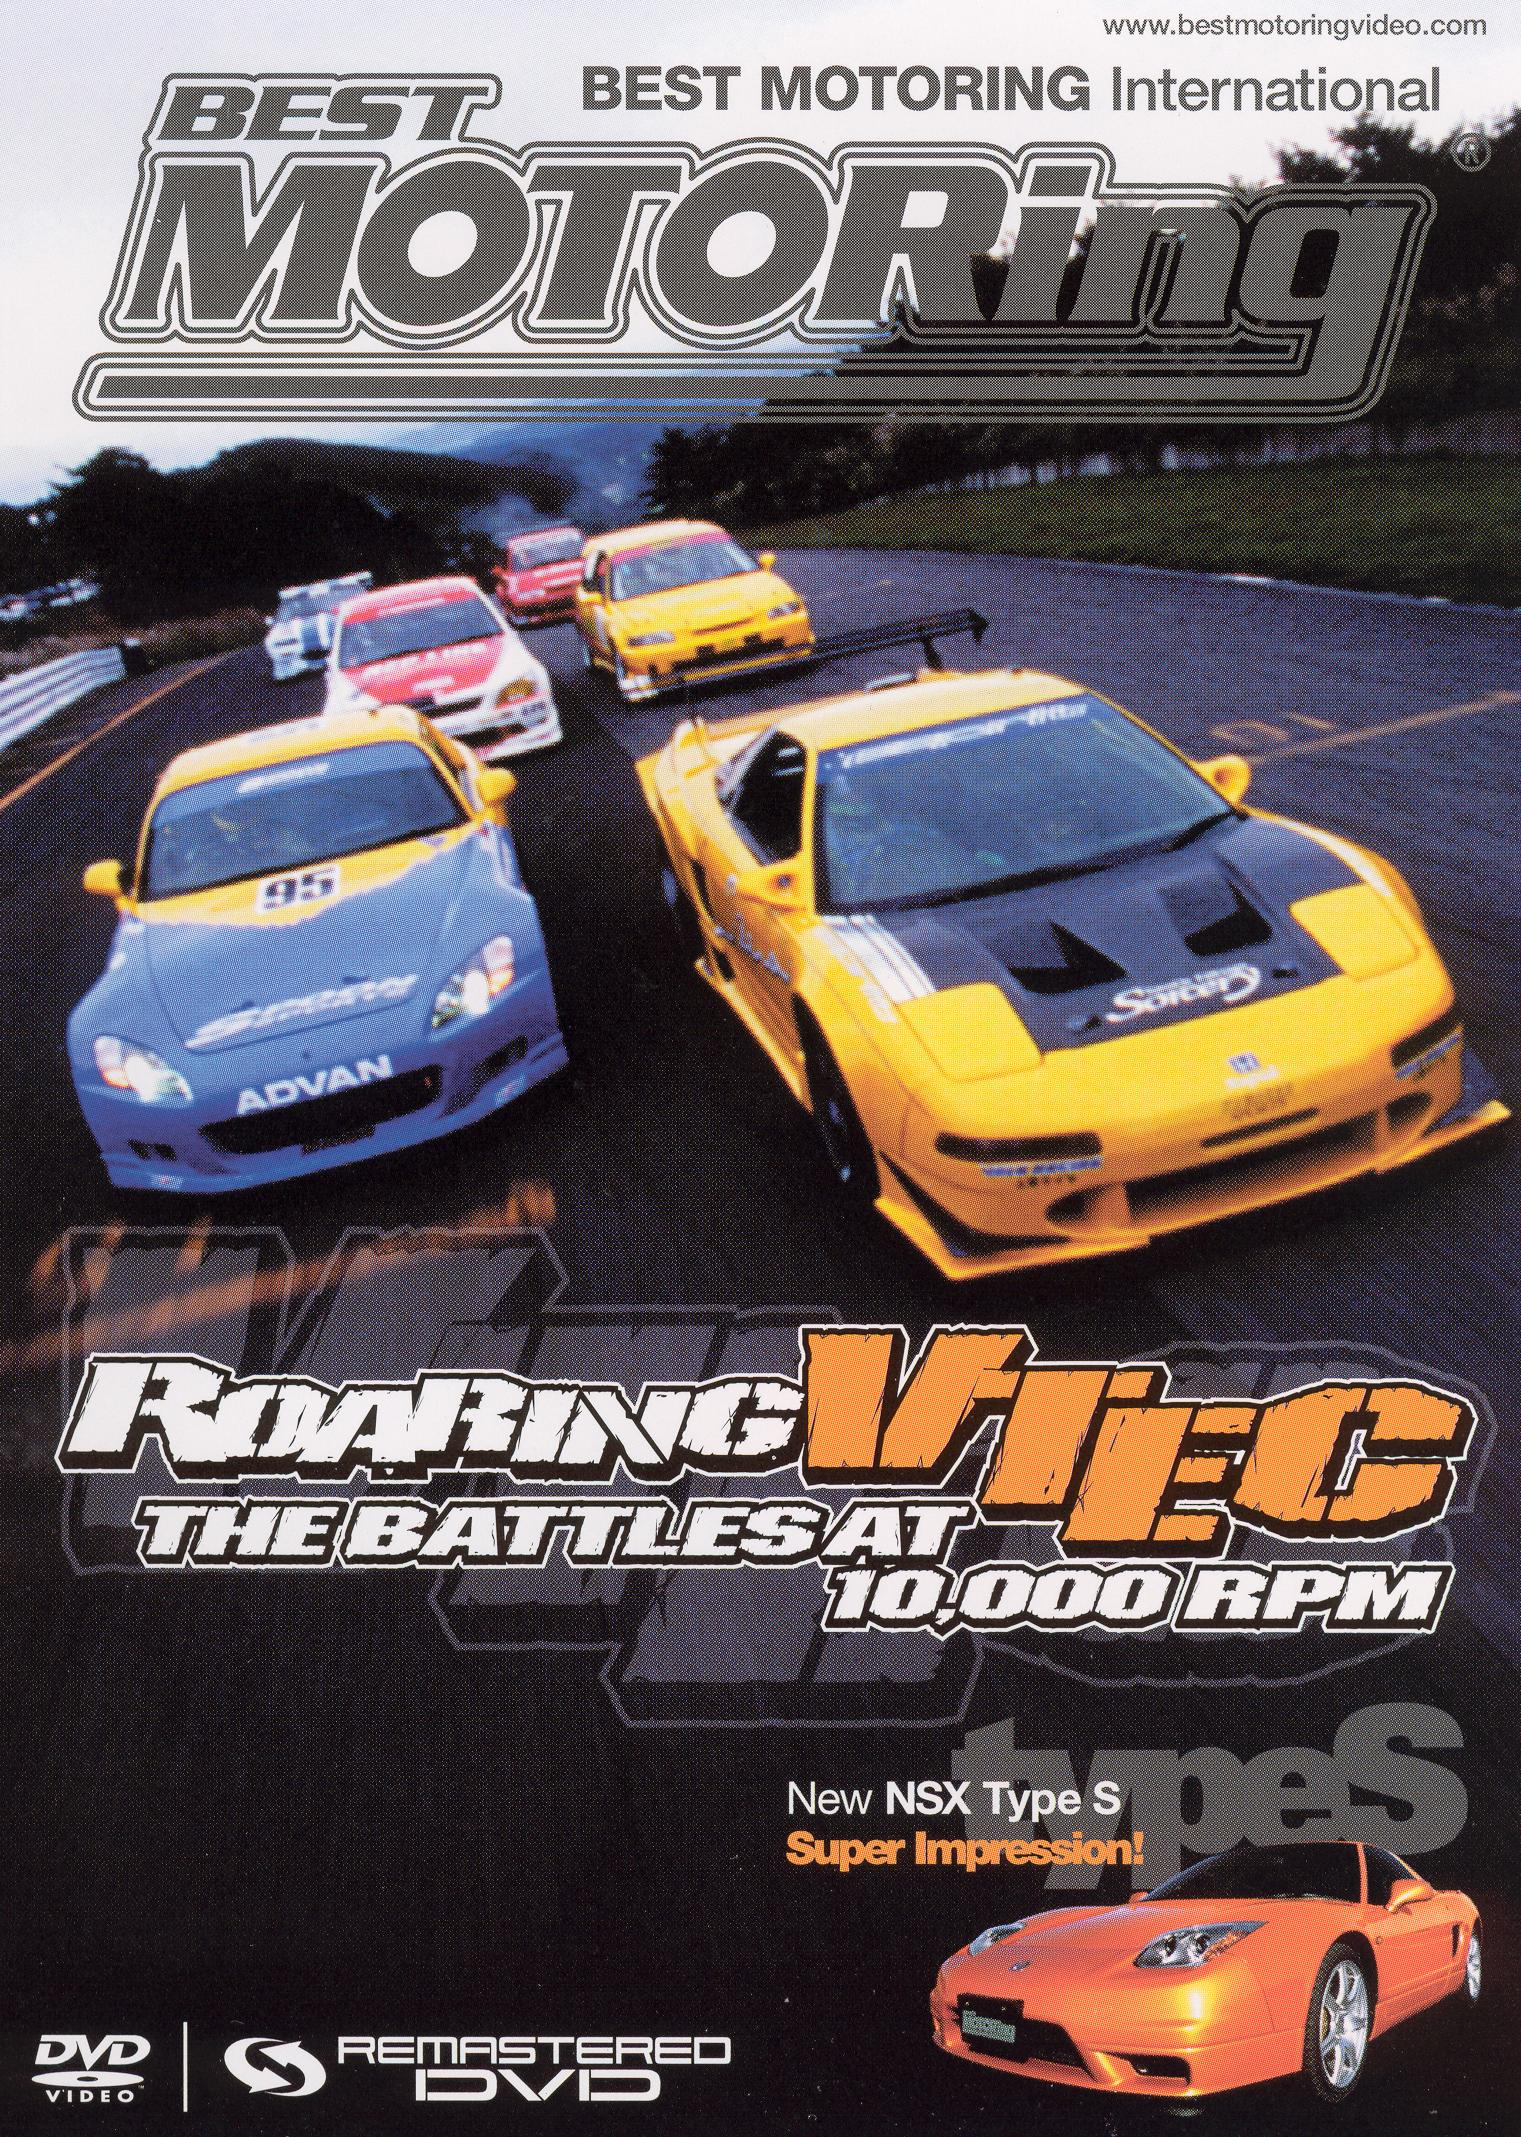 Best Motoring: Roaring VTEC - The Battles At 10,000 rpm